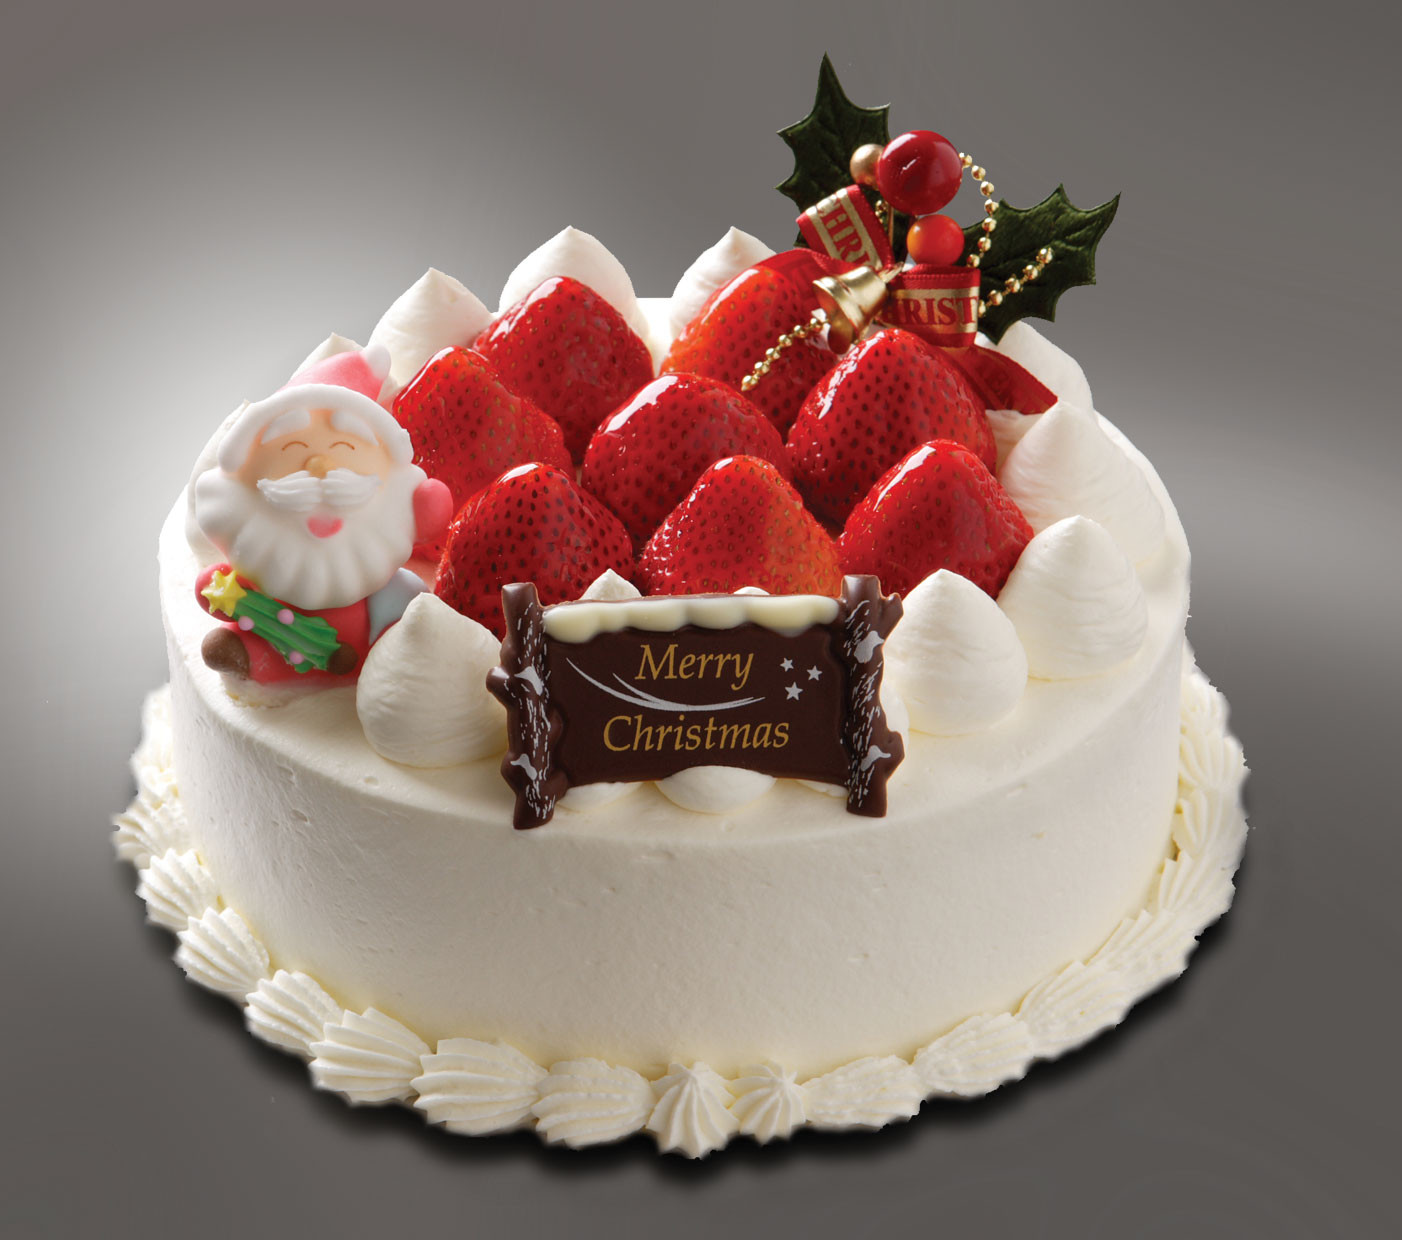 Christmas Cakes Japan  Jeri and Japan Christmas in Japan